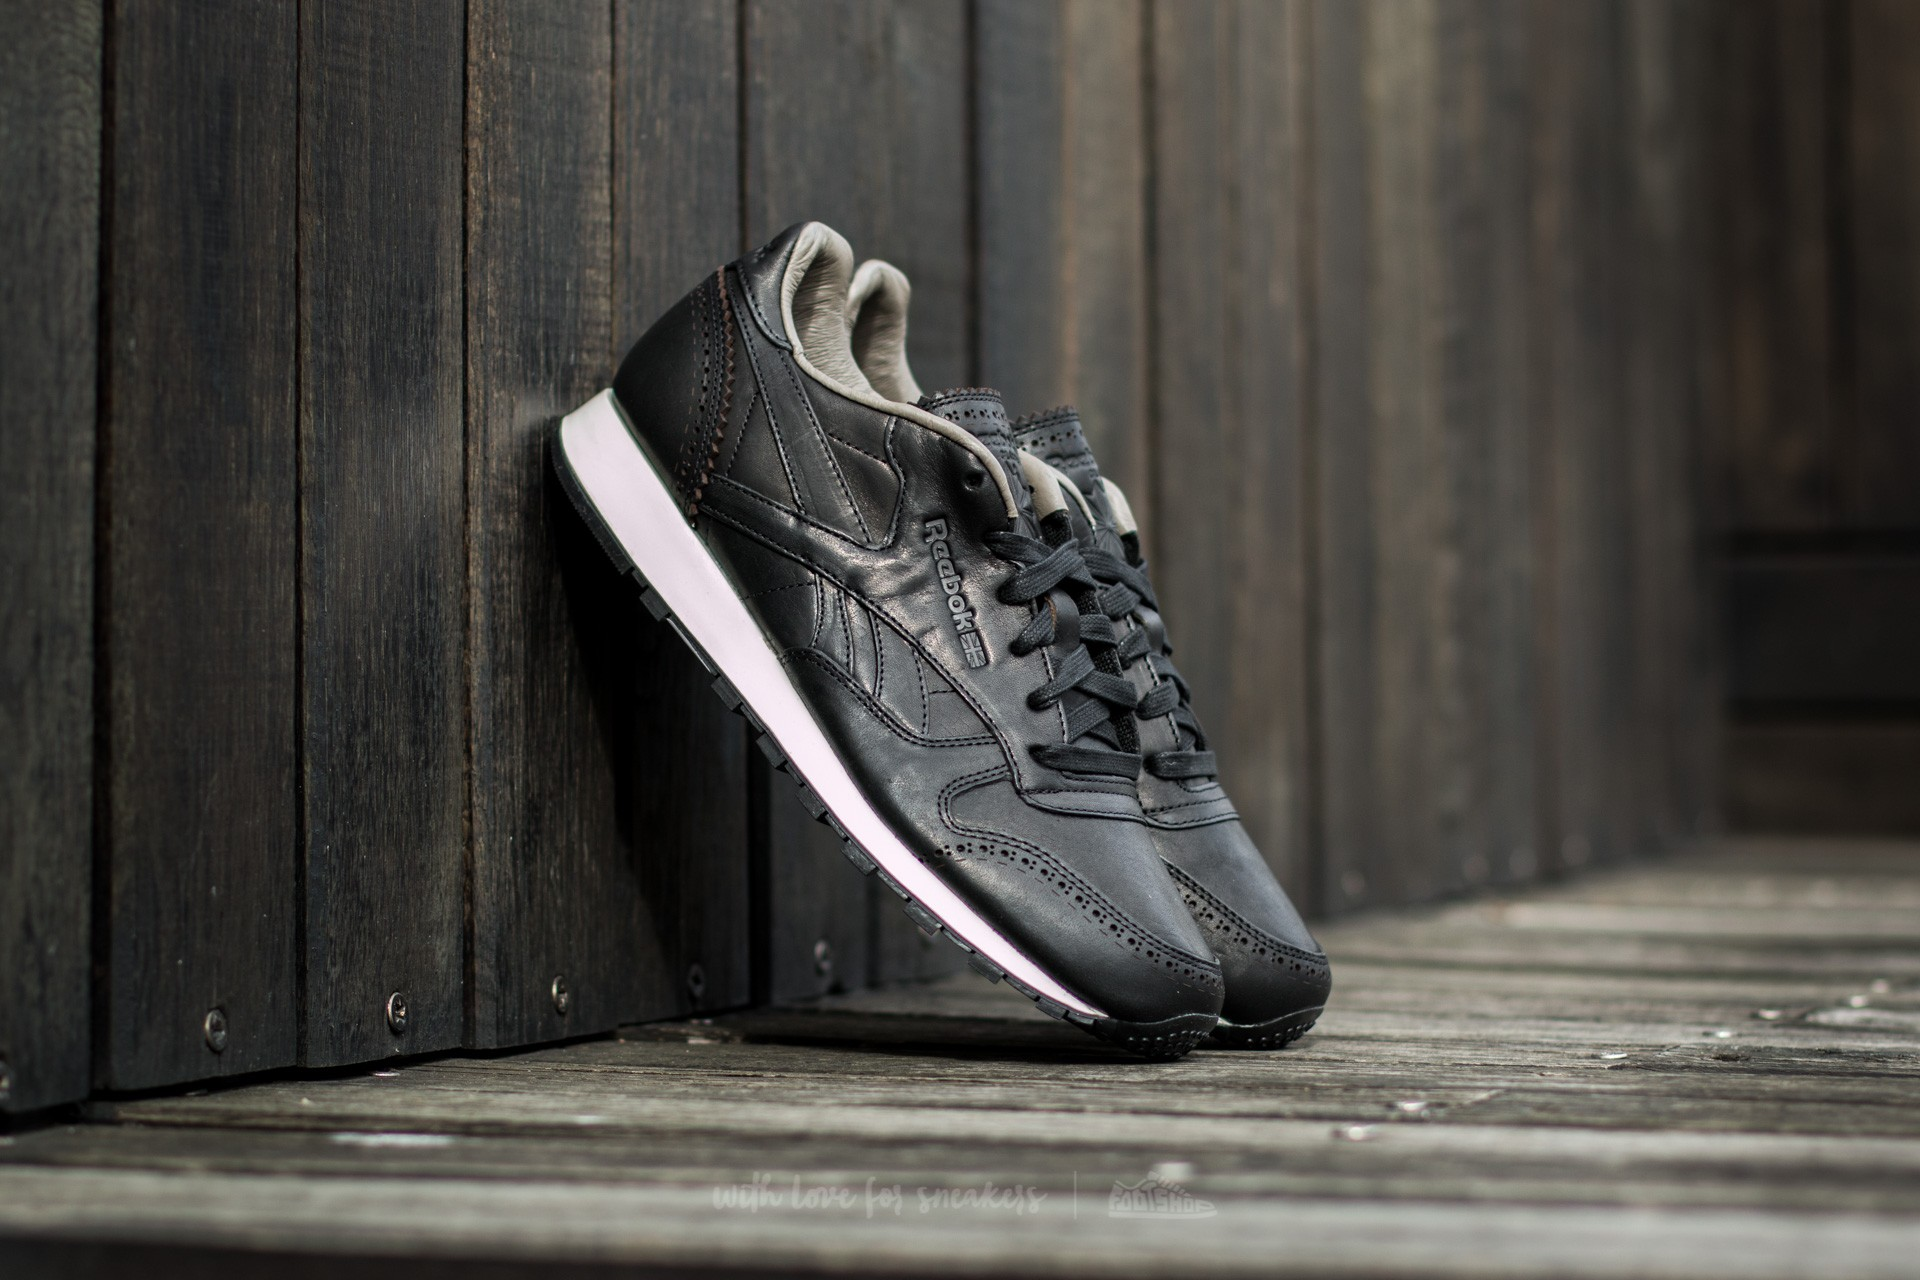 a649afe9c9eea Reebok Classic Leather Lux Horween Black  Coal  Chalk